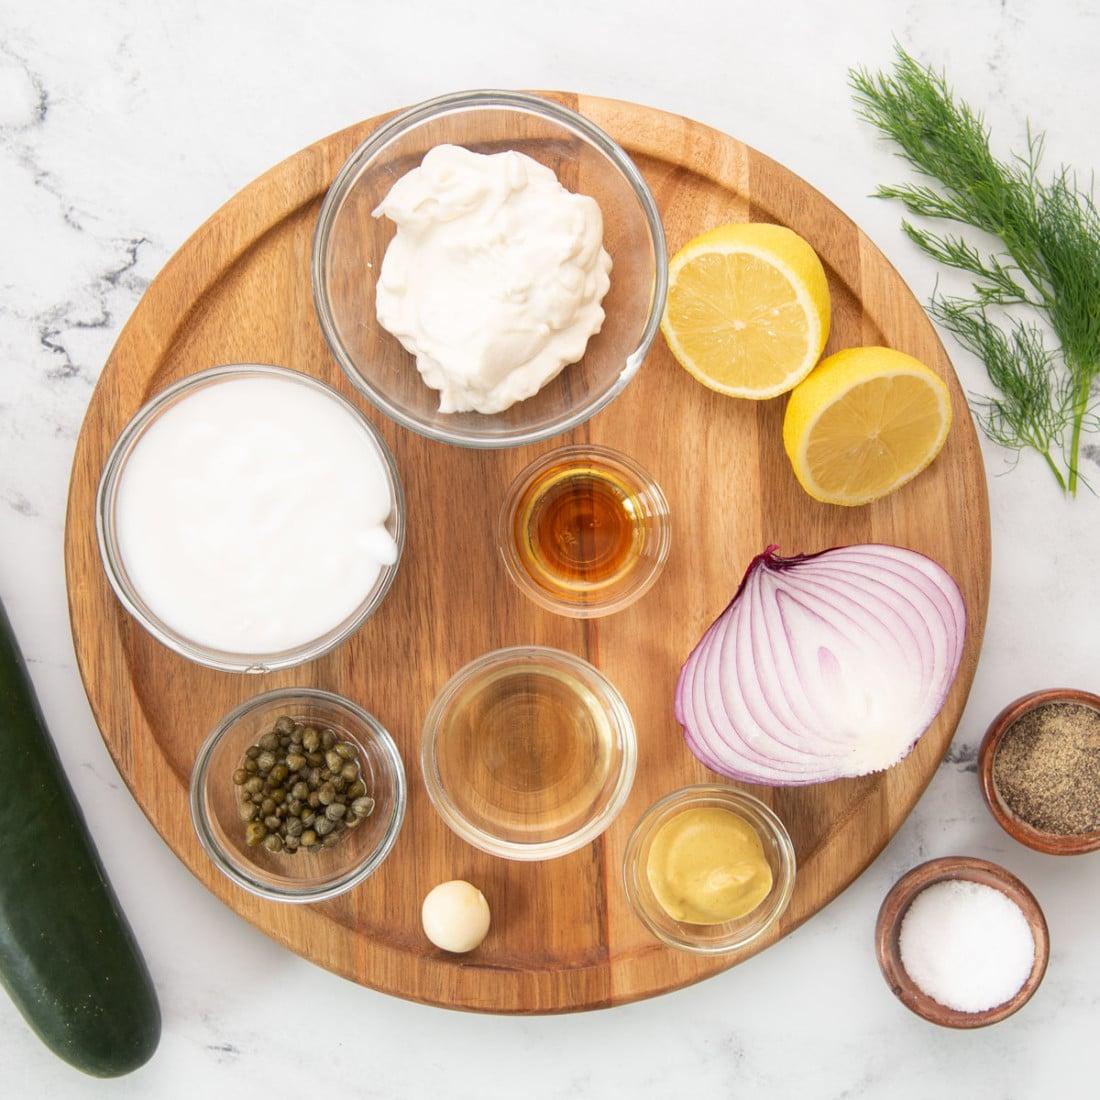 plant-based mayo, yogurt, vinegar, lemon, capers, onion, cucumber, dill on a board